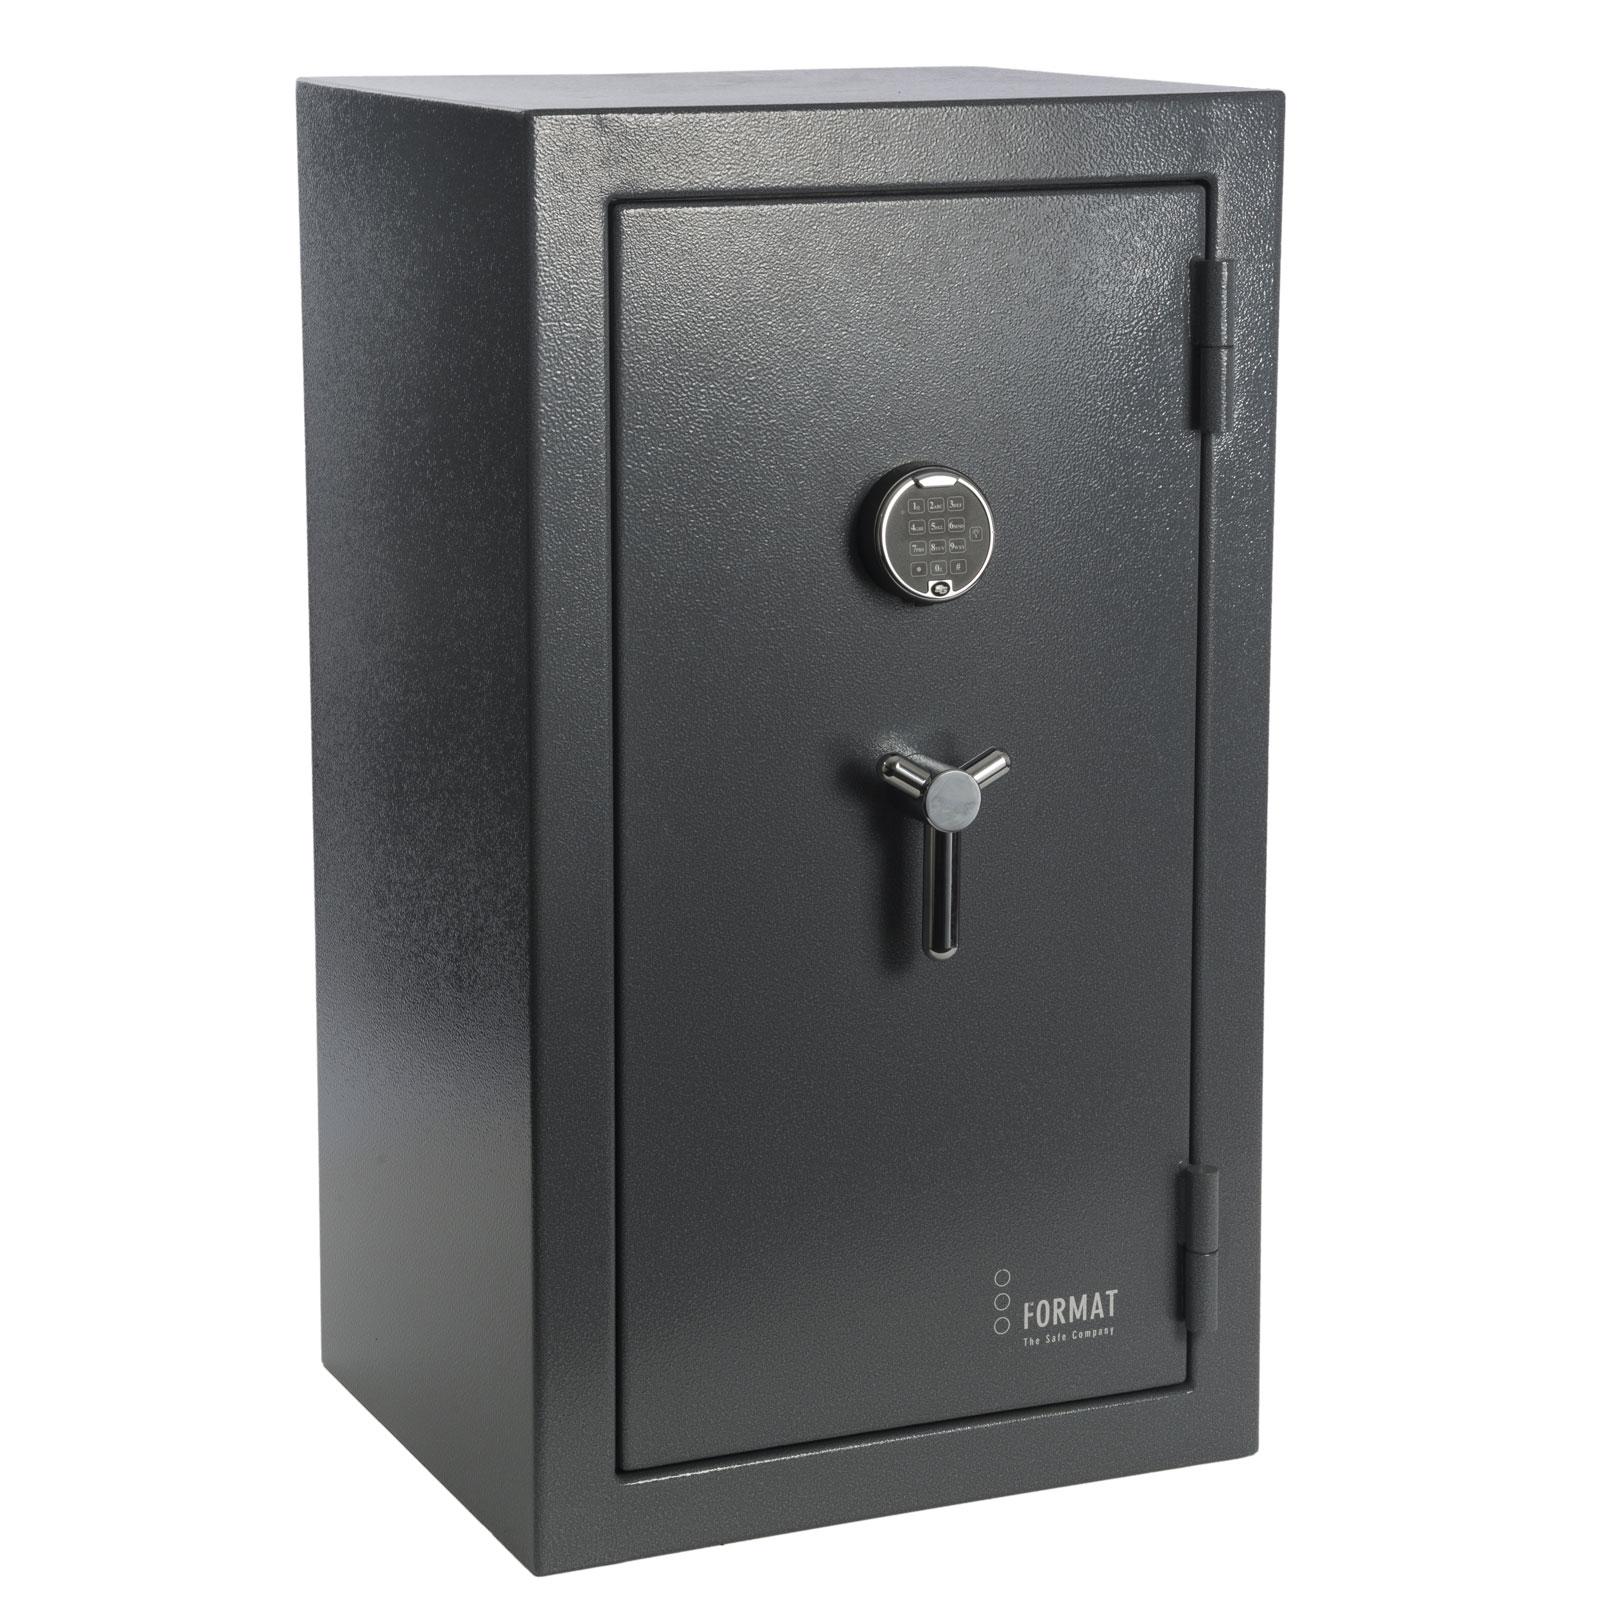 Format Ba12e Home Safe 90 Min 1400 Fire Rating Ba12e